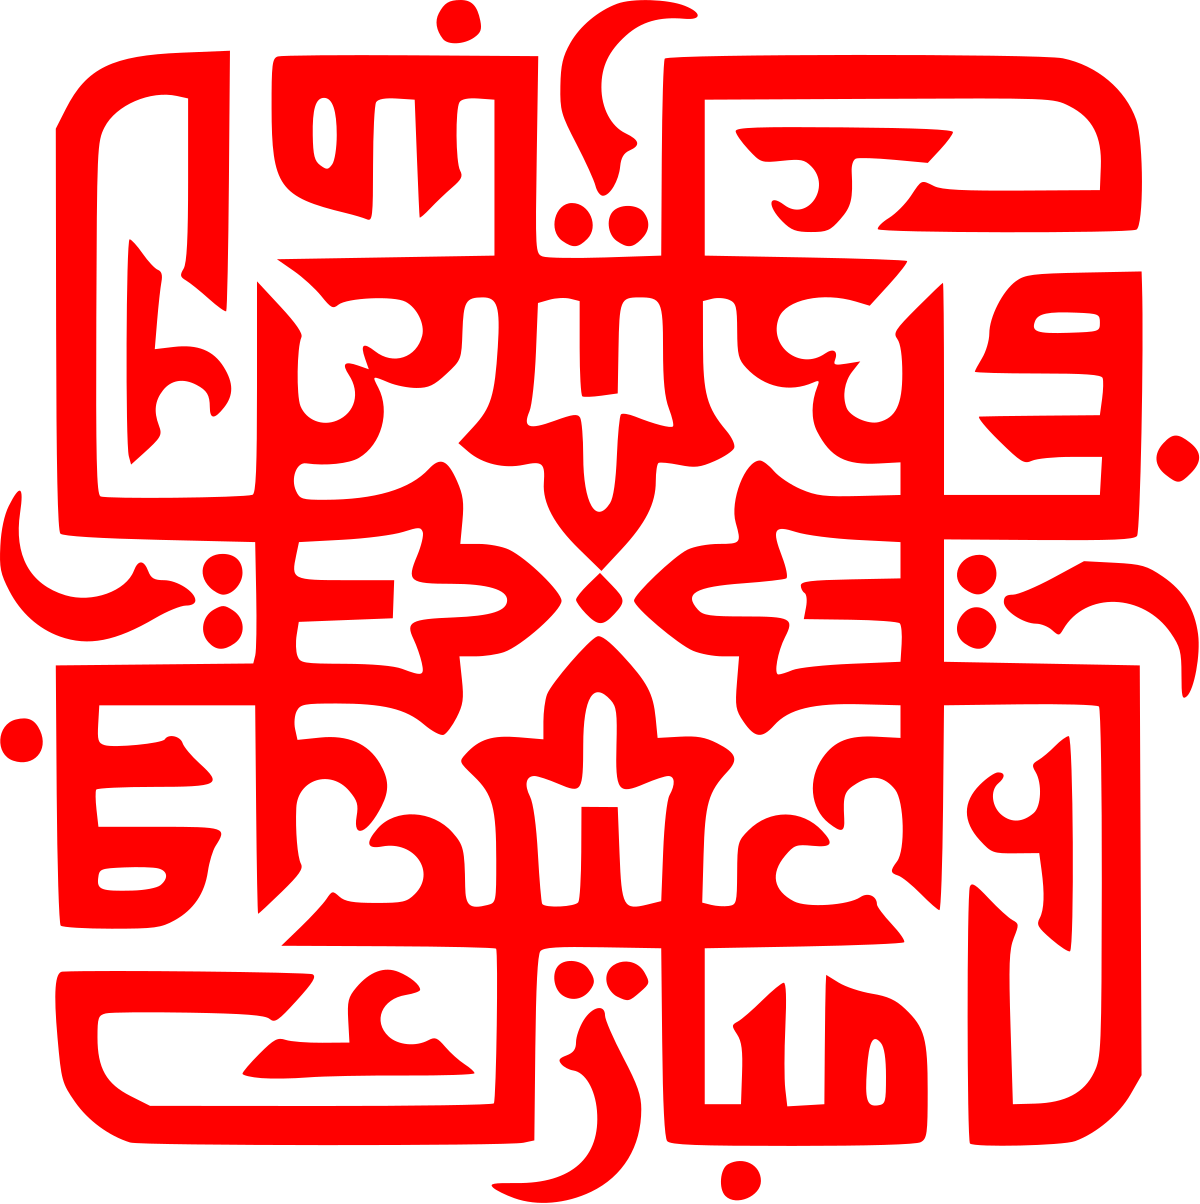 eid mubarak, eid qurban logo, symbol hd picture